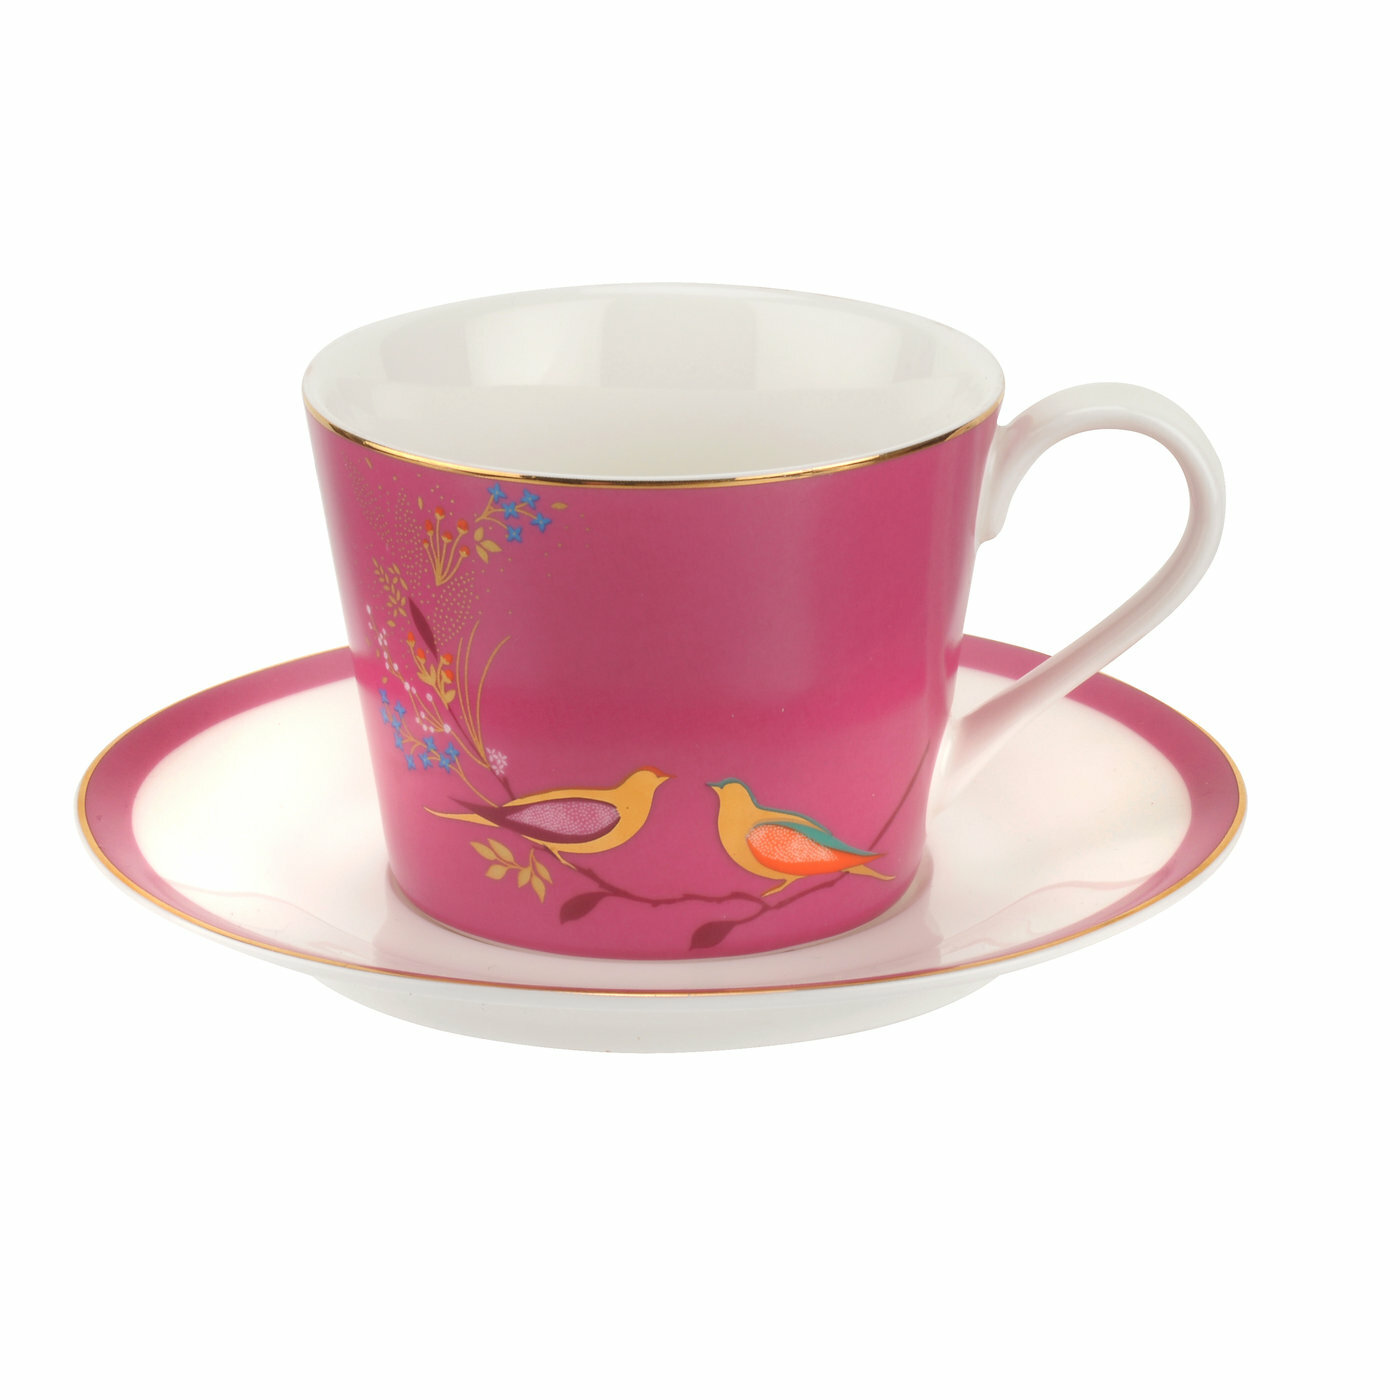 Multi-Colour, Sara Miller for Portmeirion Chelsea Tea Spoons Set of 4 Ceramic